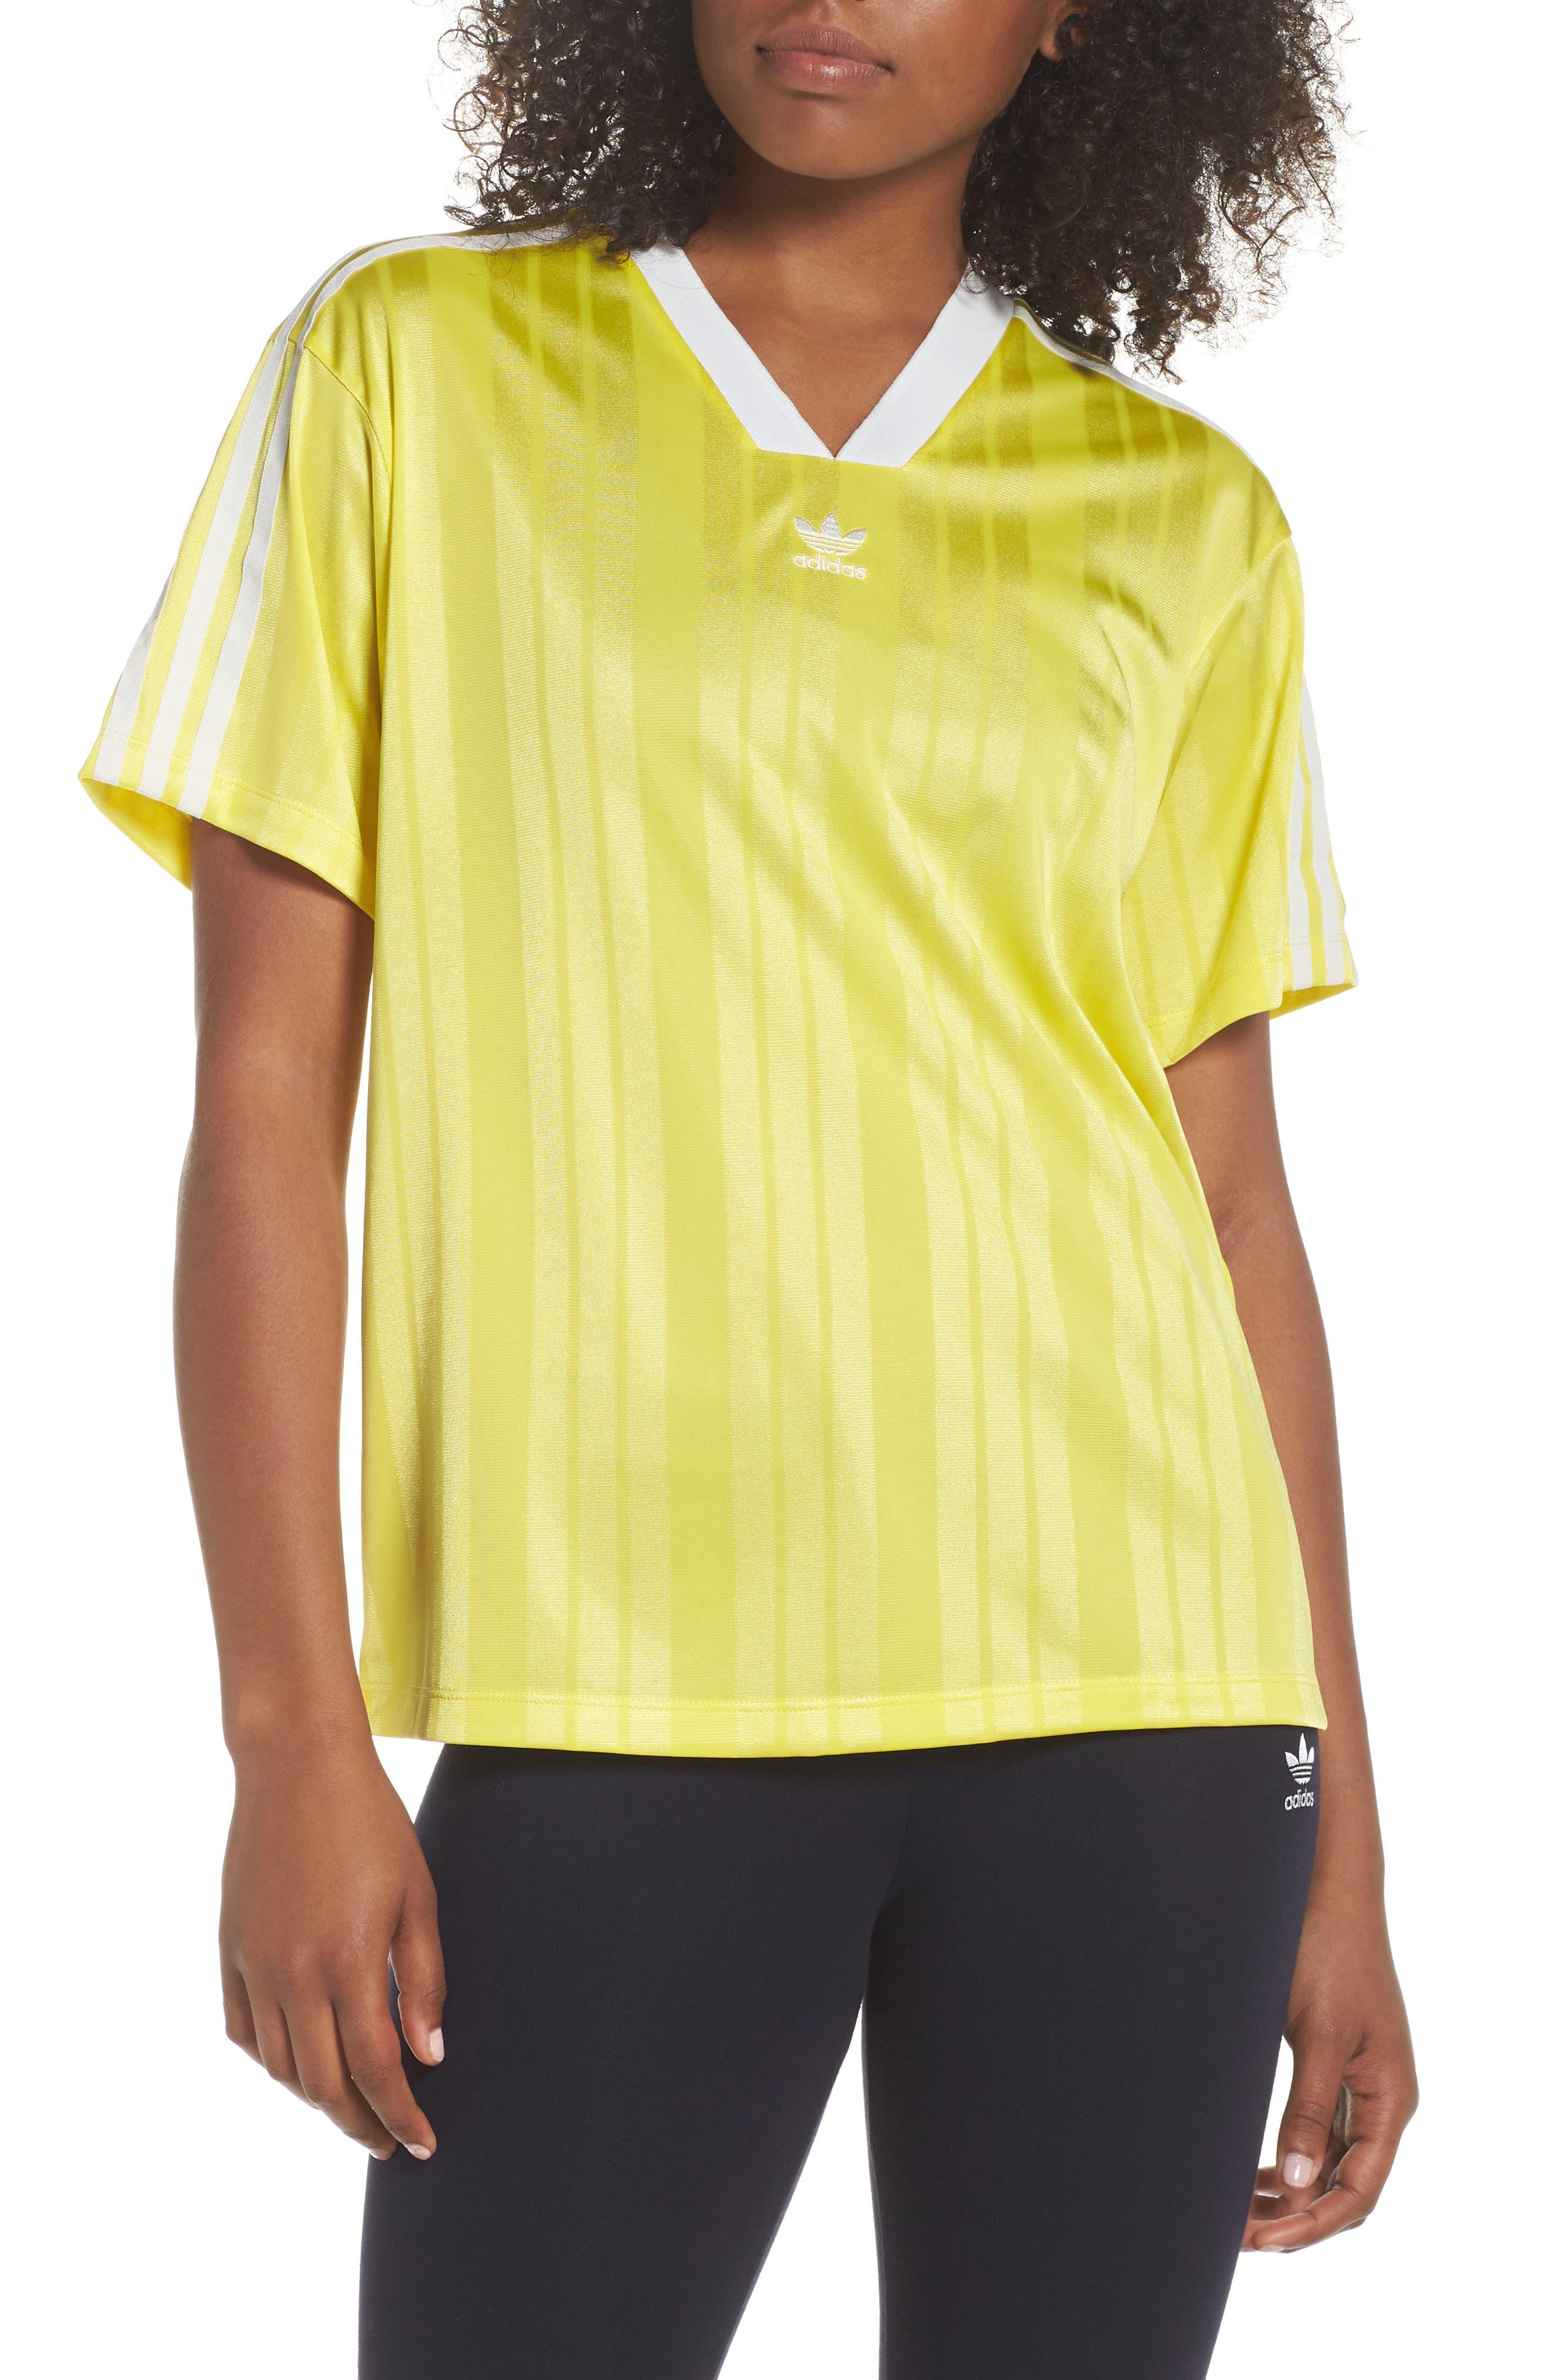 Originals Fashion League Jersey Tee,                             Main thumbnail 1, color,                             Prime Yellow